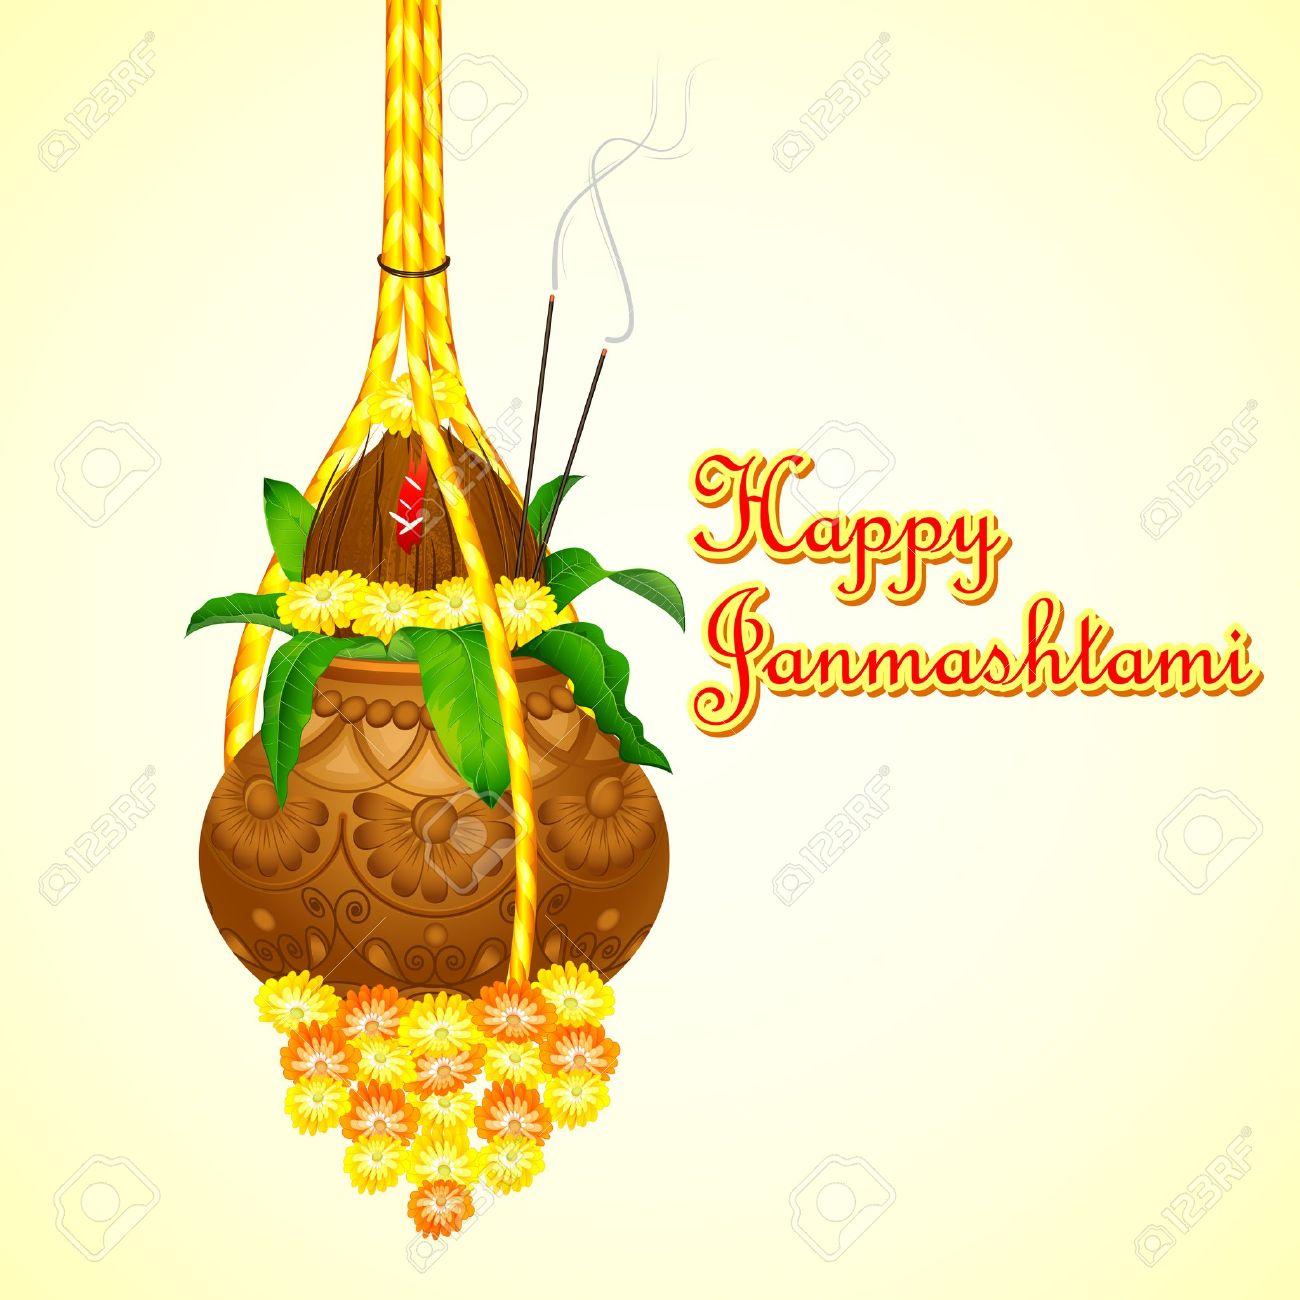 God Radhe Krishna Wish You Happy Janmashtami